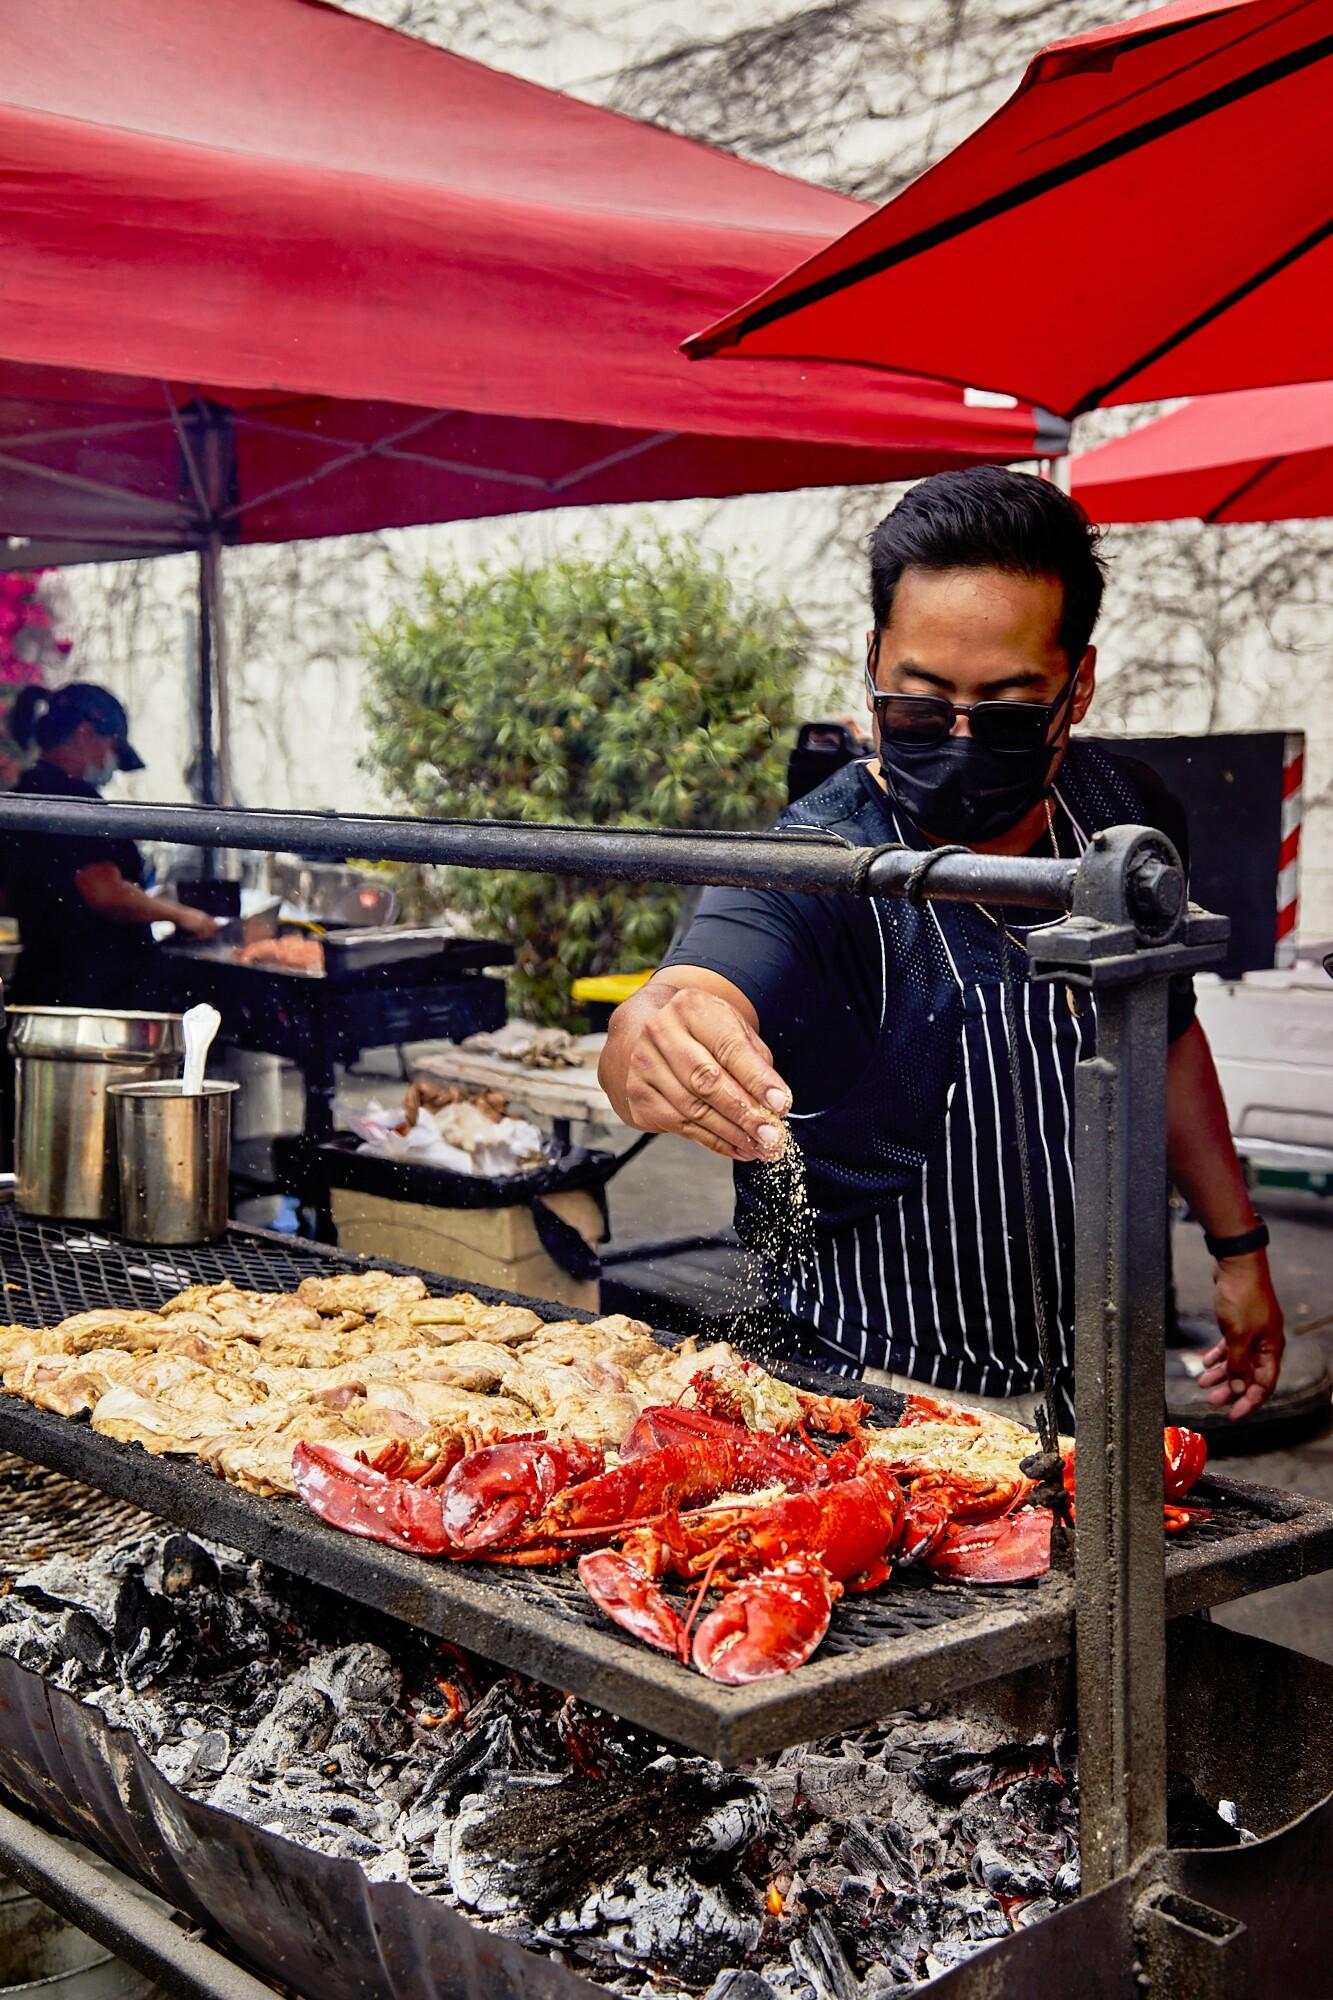 Johnny Angeles seasons lobsters at Lobsterdamus. He stands beneath red umbrellas.